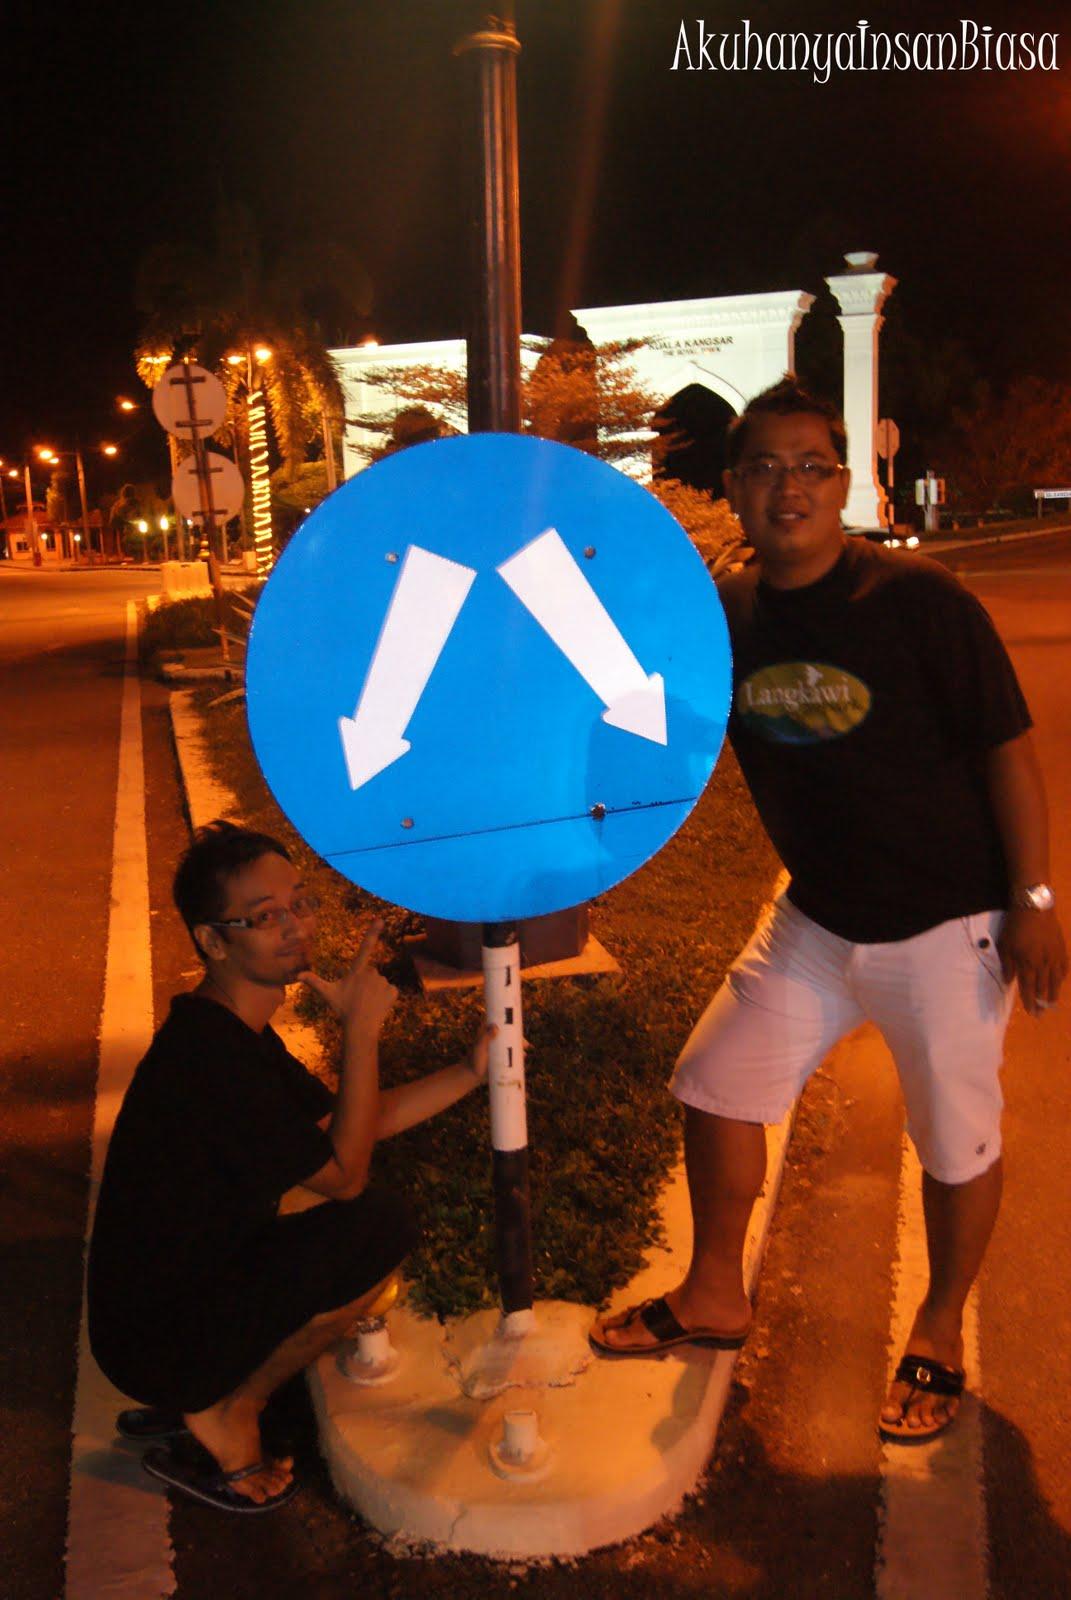 kuala kangsar jewish singles Kuala kangsar tourism: tripadvisor has 392 reviews of kuala kangsar hotels, attractions, and restaurants making it your best kuala kangsar resource.